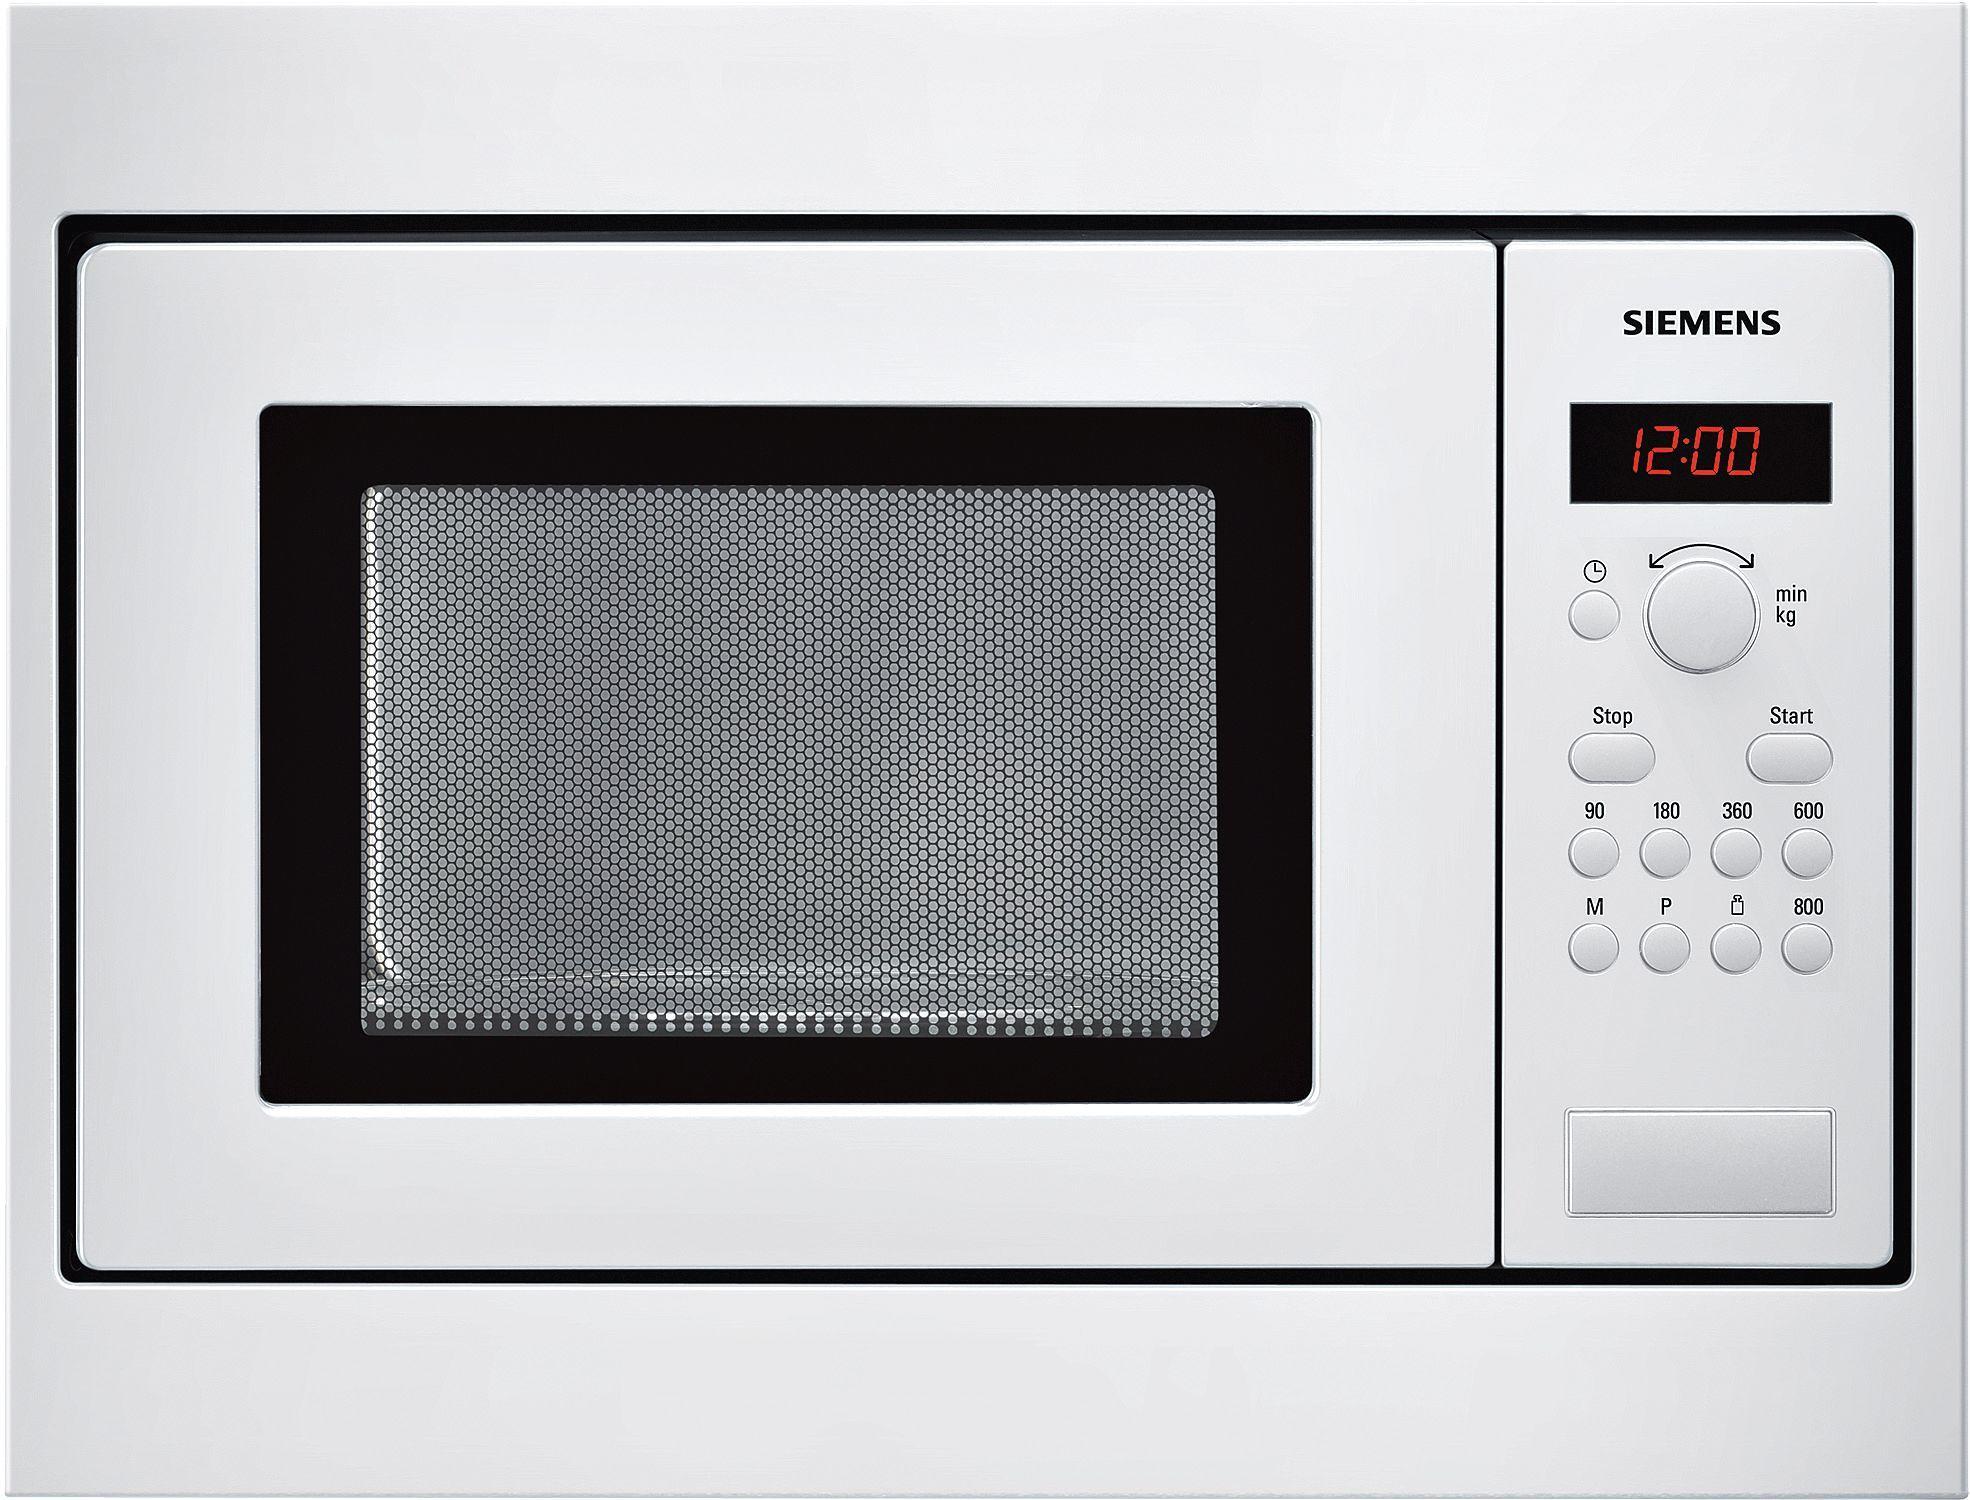 Siemens HF15M251 iQ100 Einbau Mikrowelle, 800 W, 17l